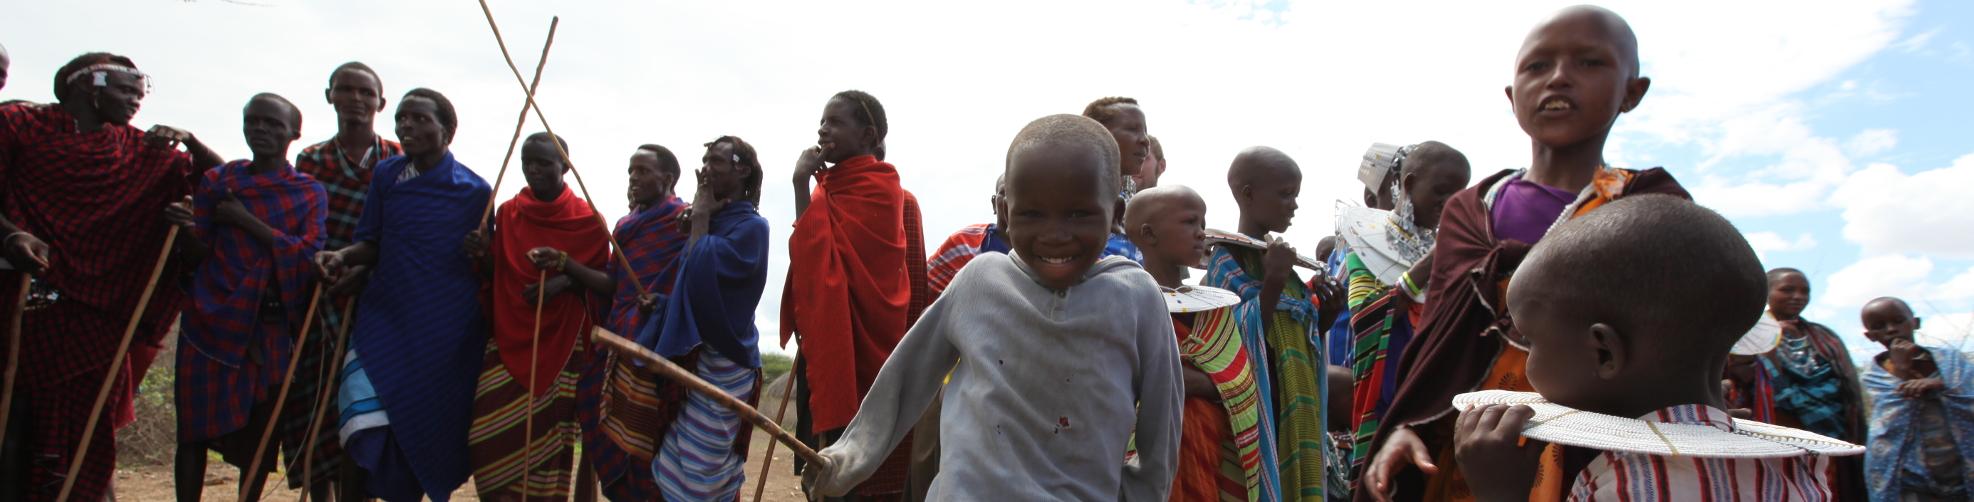 the Maasai and Lems